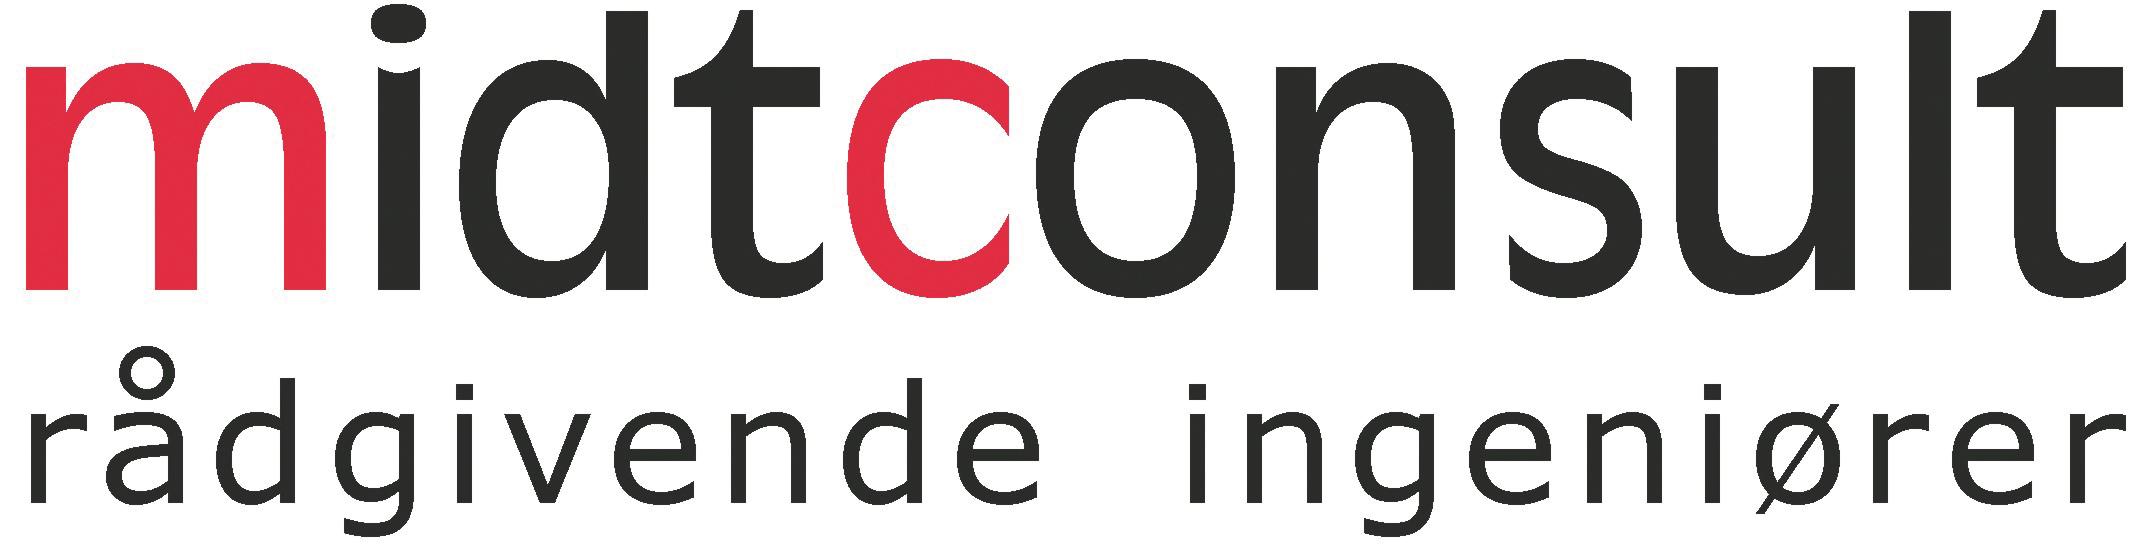 Midtconsult - rådgivende ingengiører logo